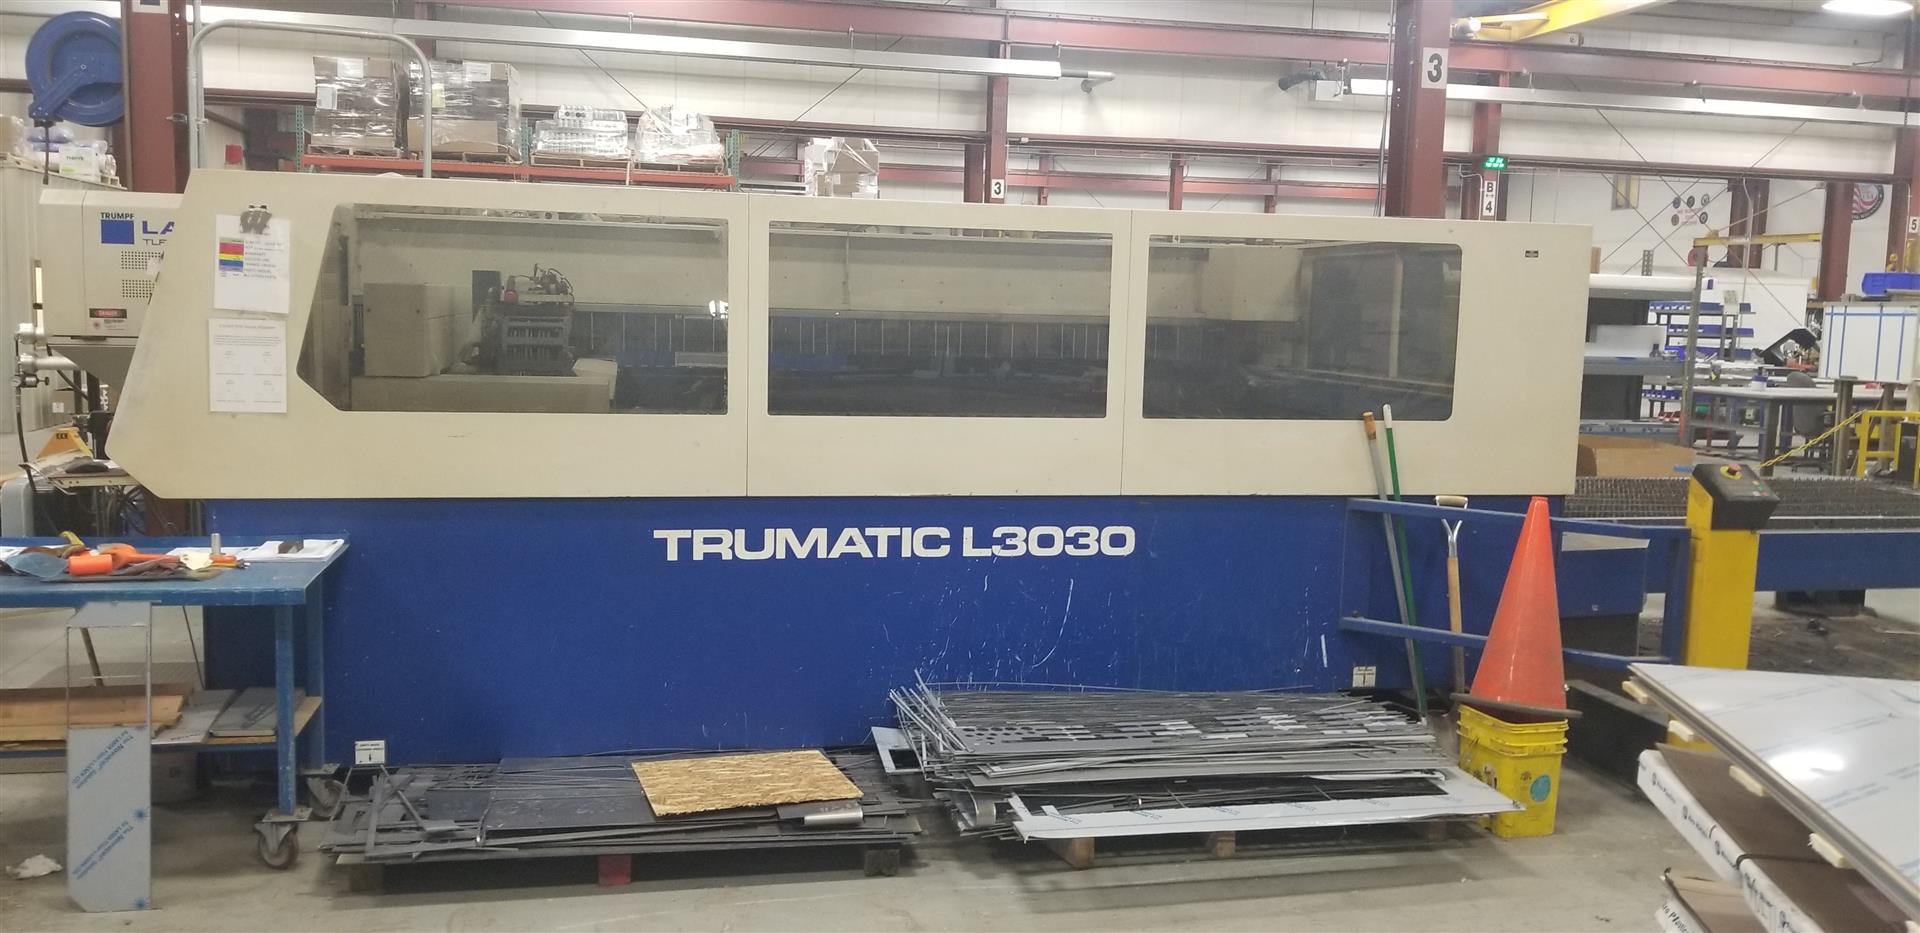 2000 Trumpf, L3030, 5' x 10', 4000 Watt Co2 Laser